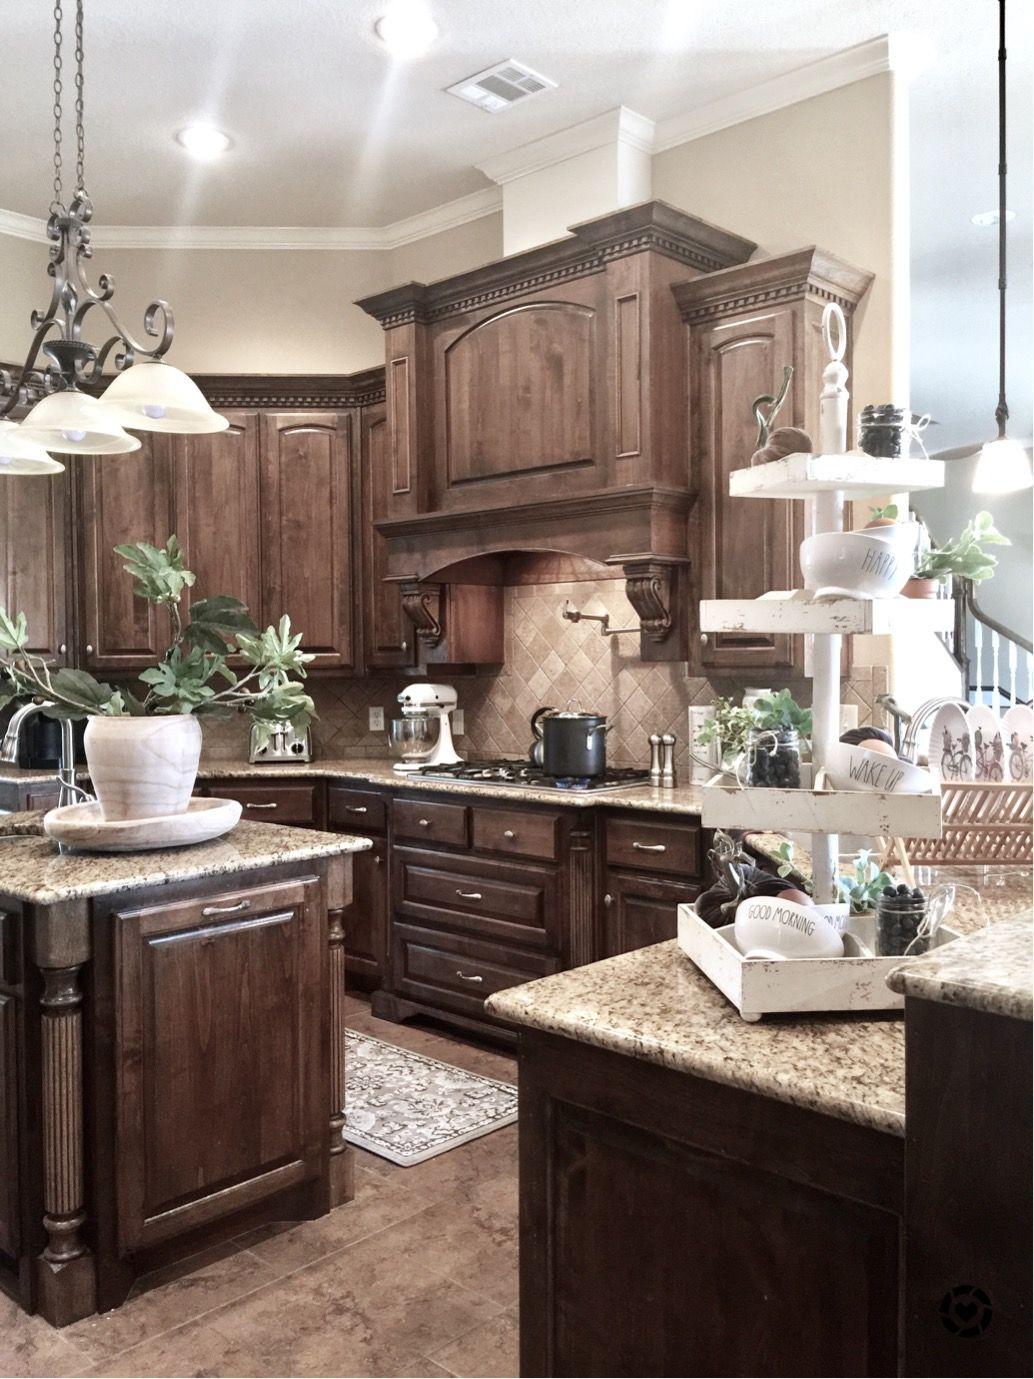 Kitchen design pinoftheday homedecor house houseplants houseideas also brown cabinet designs for  warm natural look rh pinterest